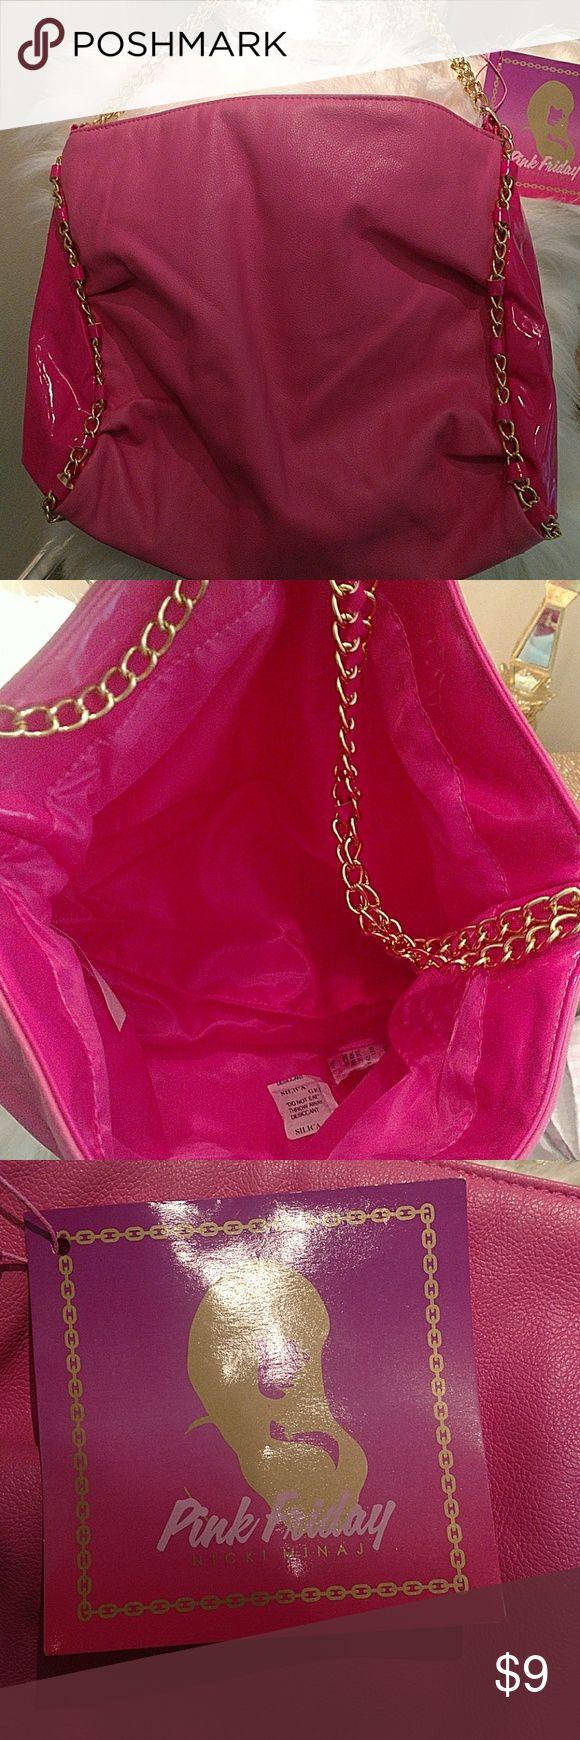 Brand New!!! Nicki Minaj Handbag Bright pink gold chain style handle Pink Friday Nicki Minaj Bags